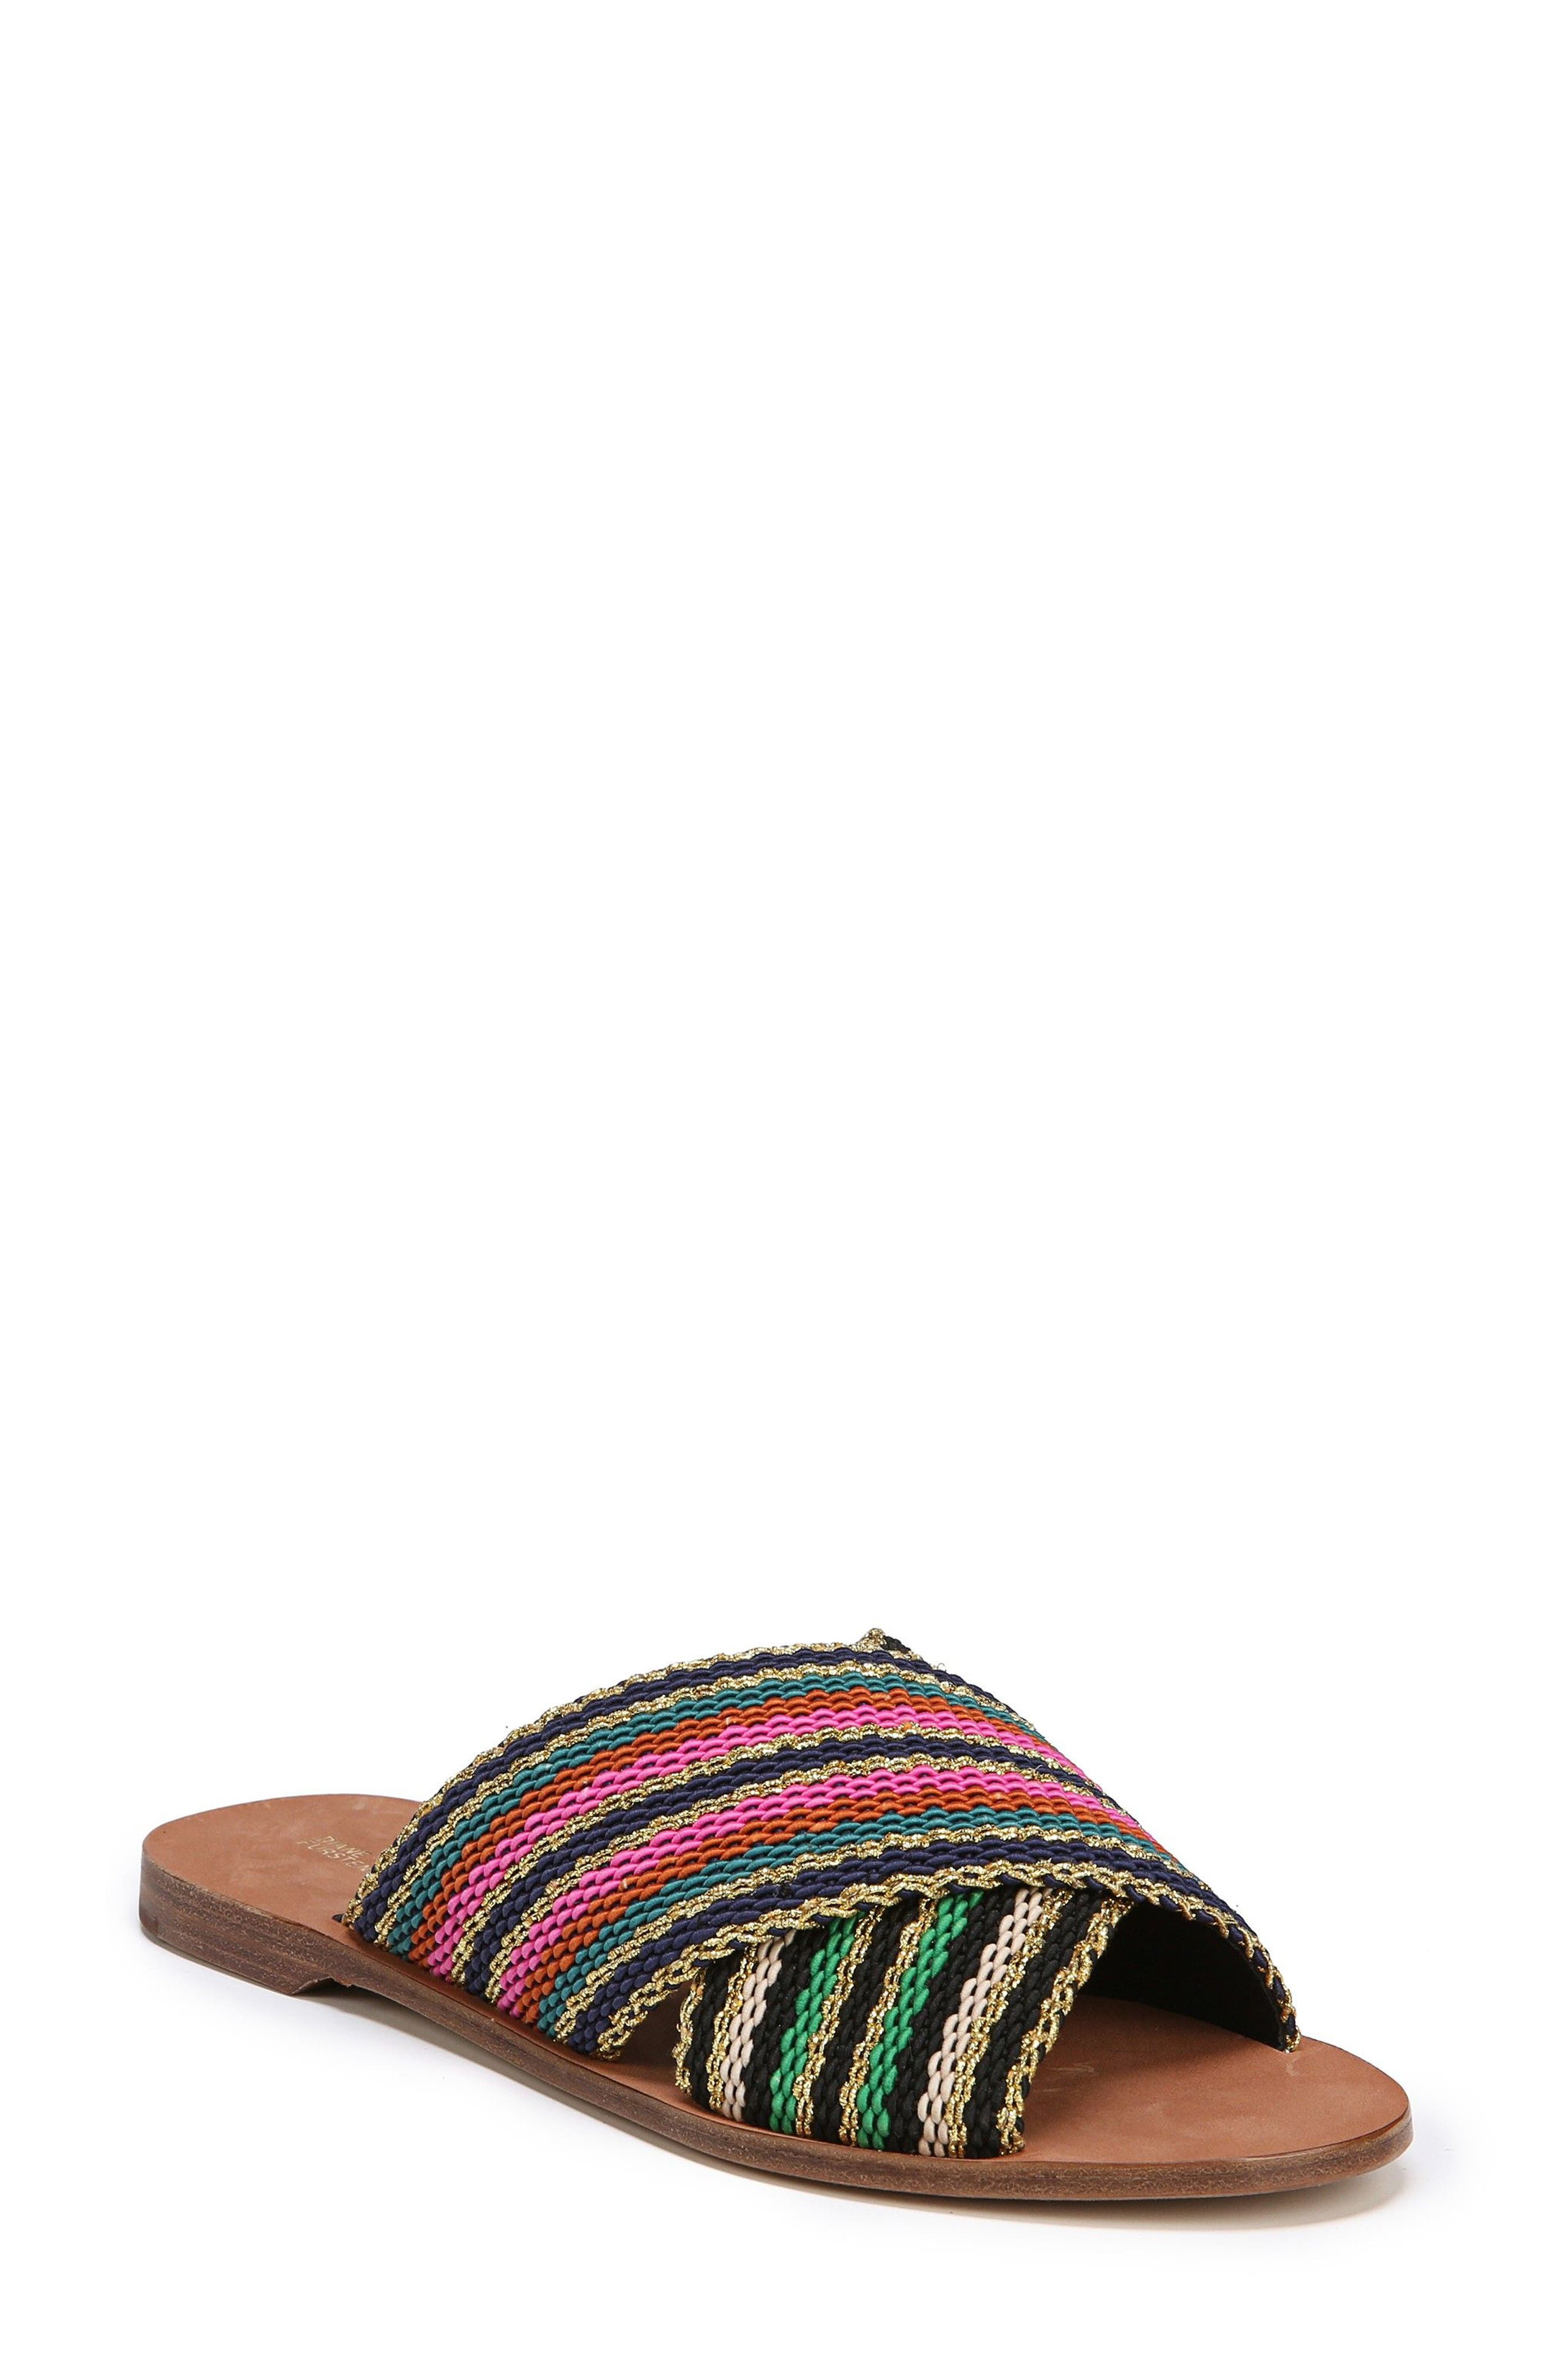 Diane Von Furstenberg Cindi Woven Slide Sandal, Black